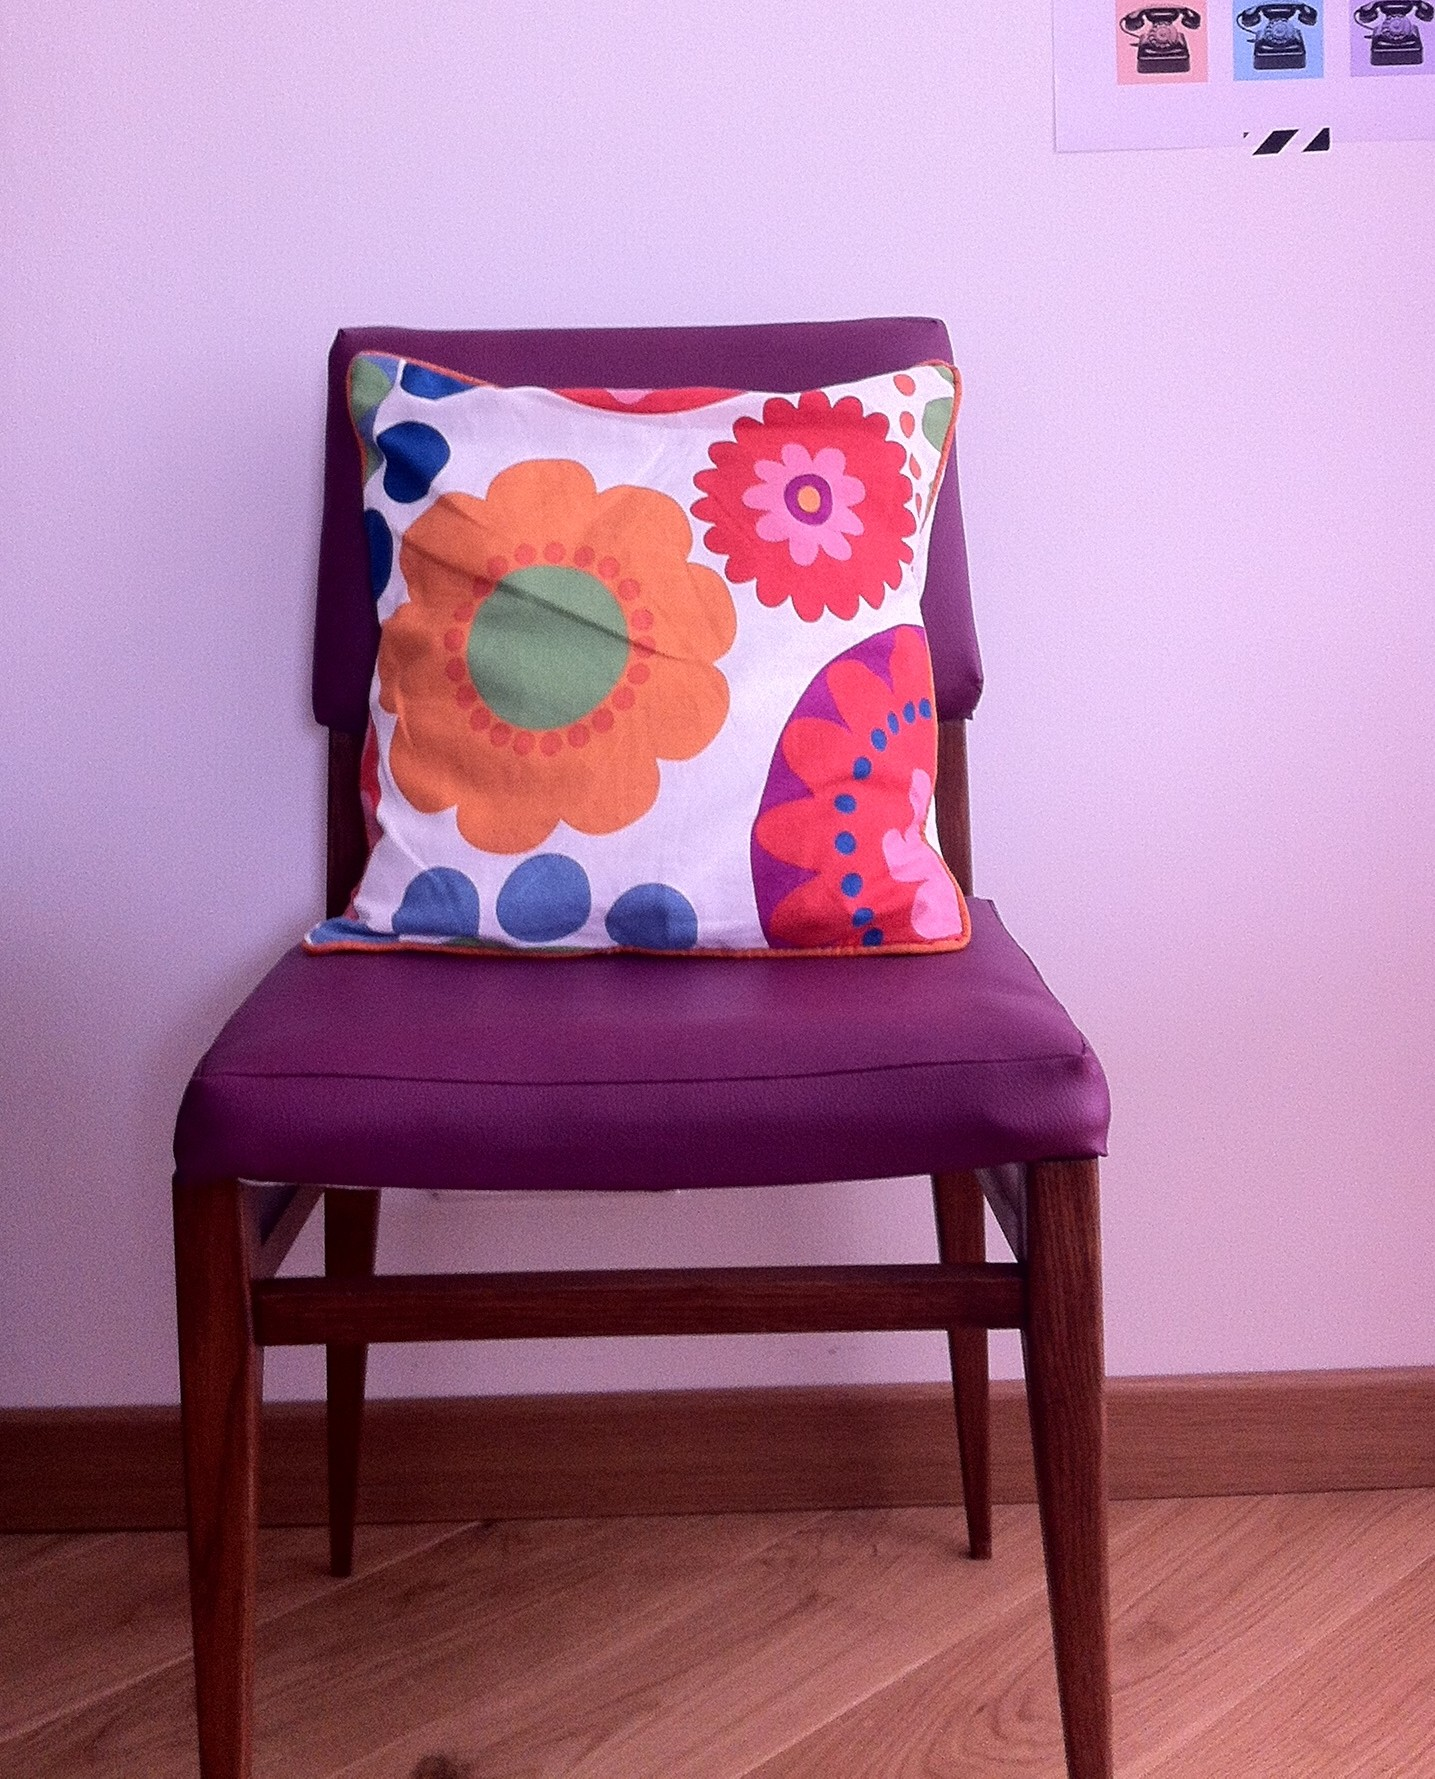 Chaise design scandinave « Prune »